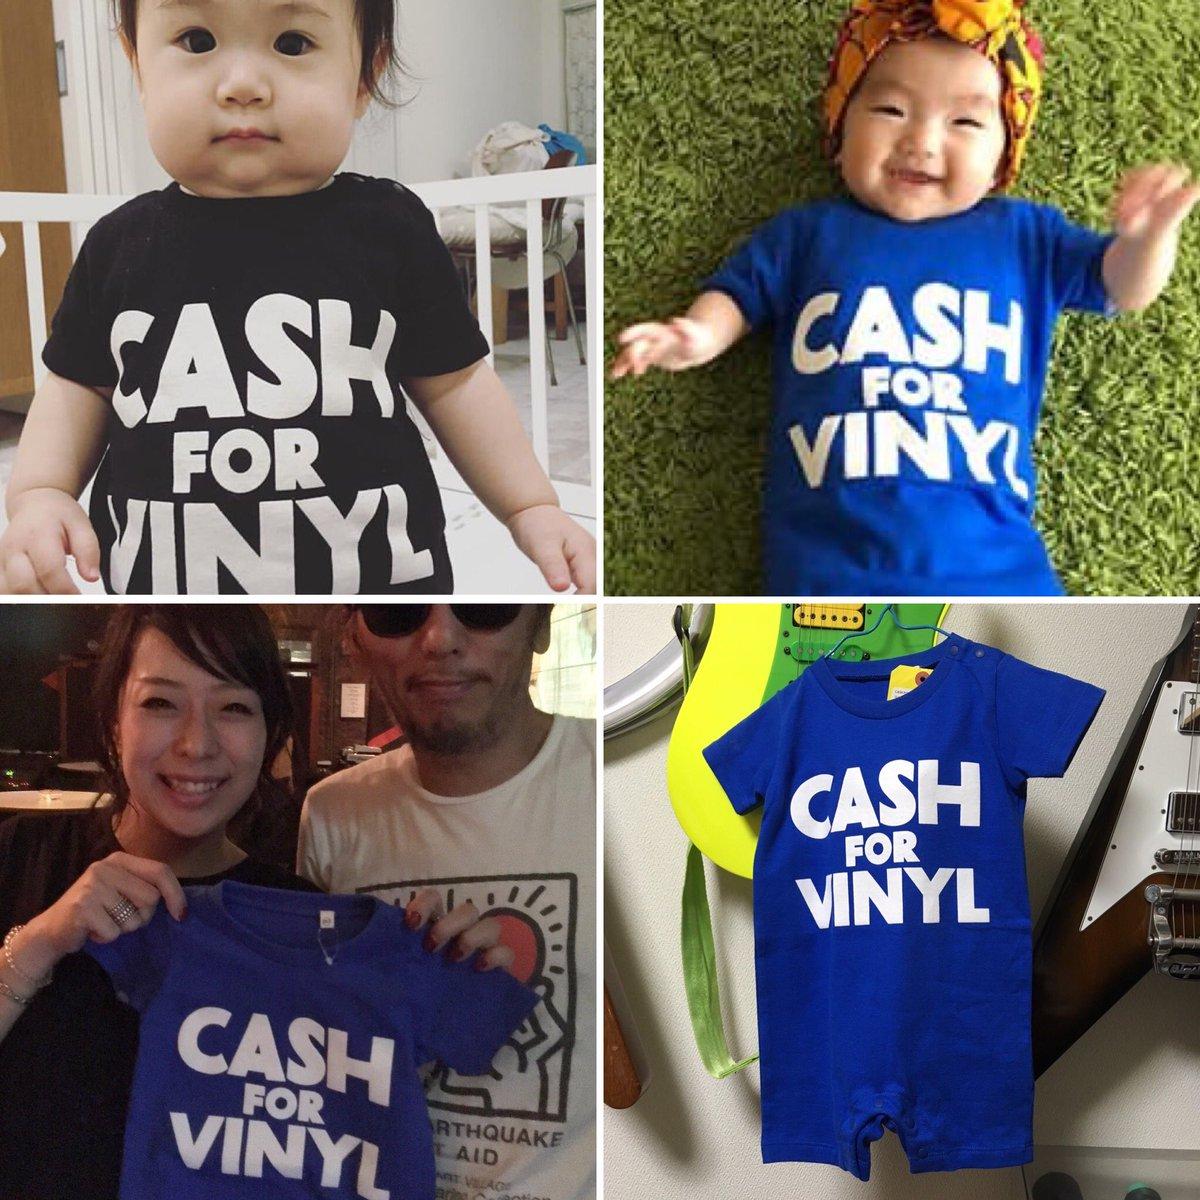 【ロンパース復活計画】  #cashforvinyl  #dj #vinyl  #OnlyVinylDJsArePretty